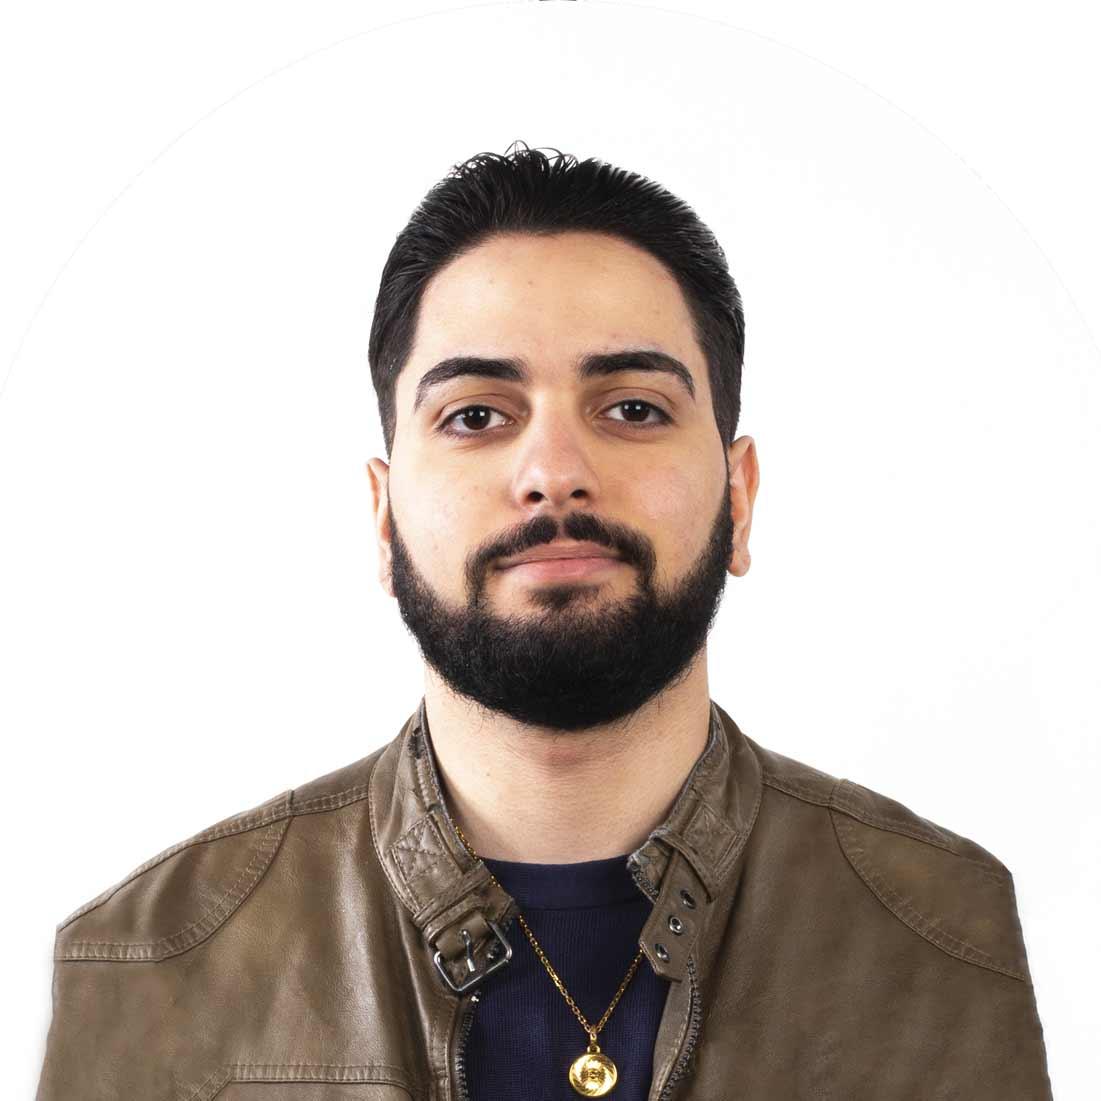 Mason Alsuhaily